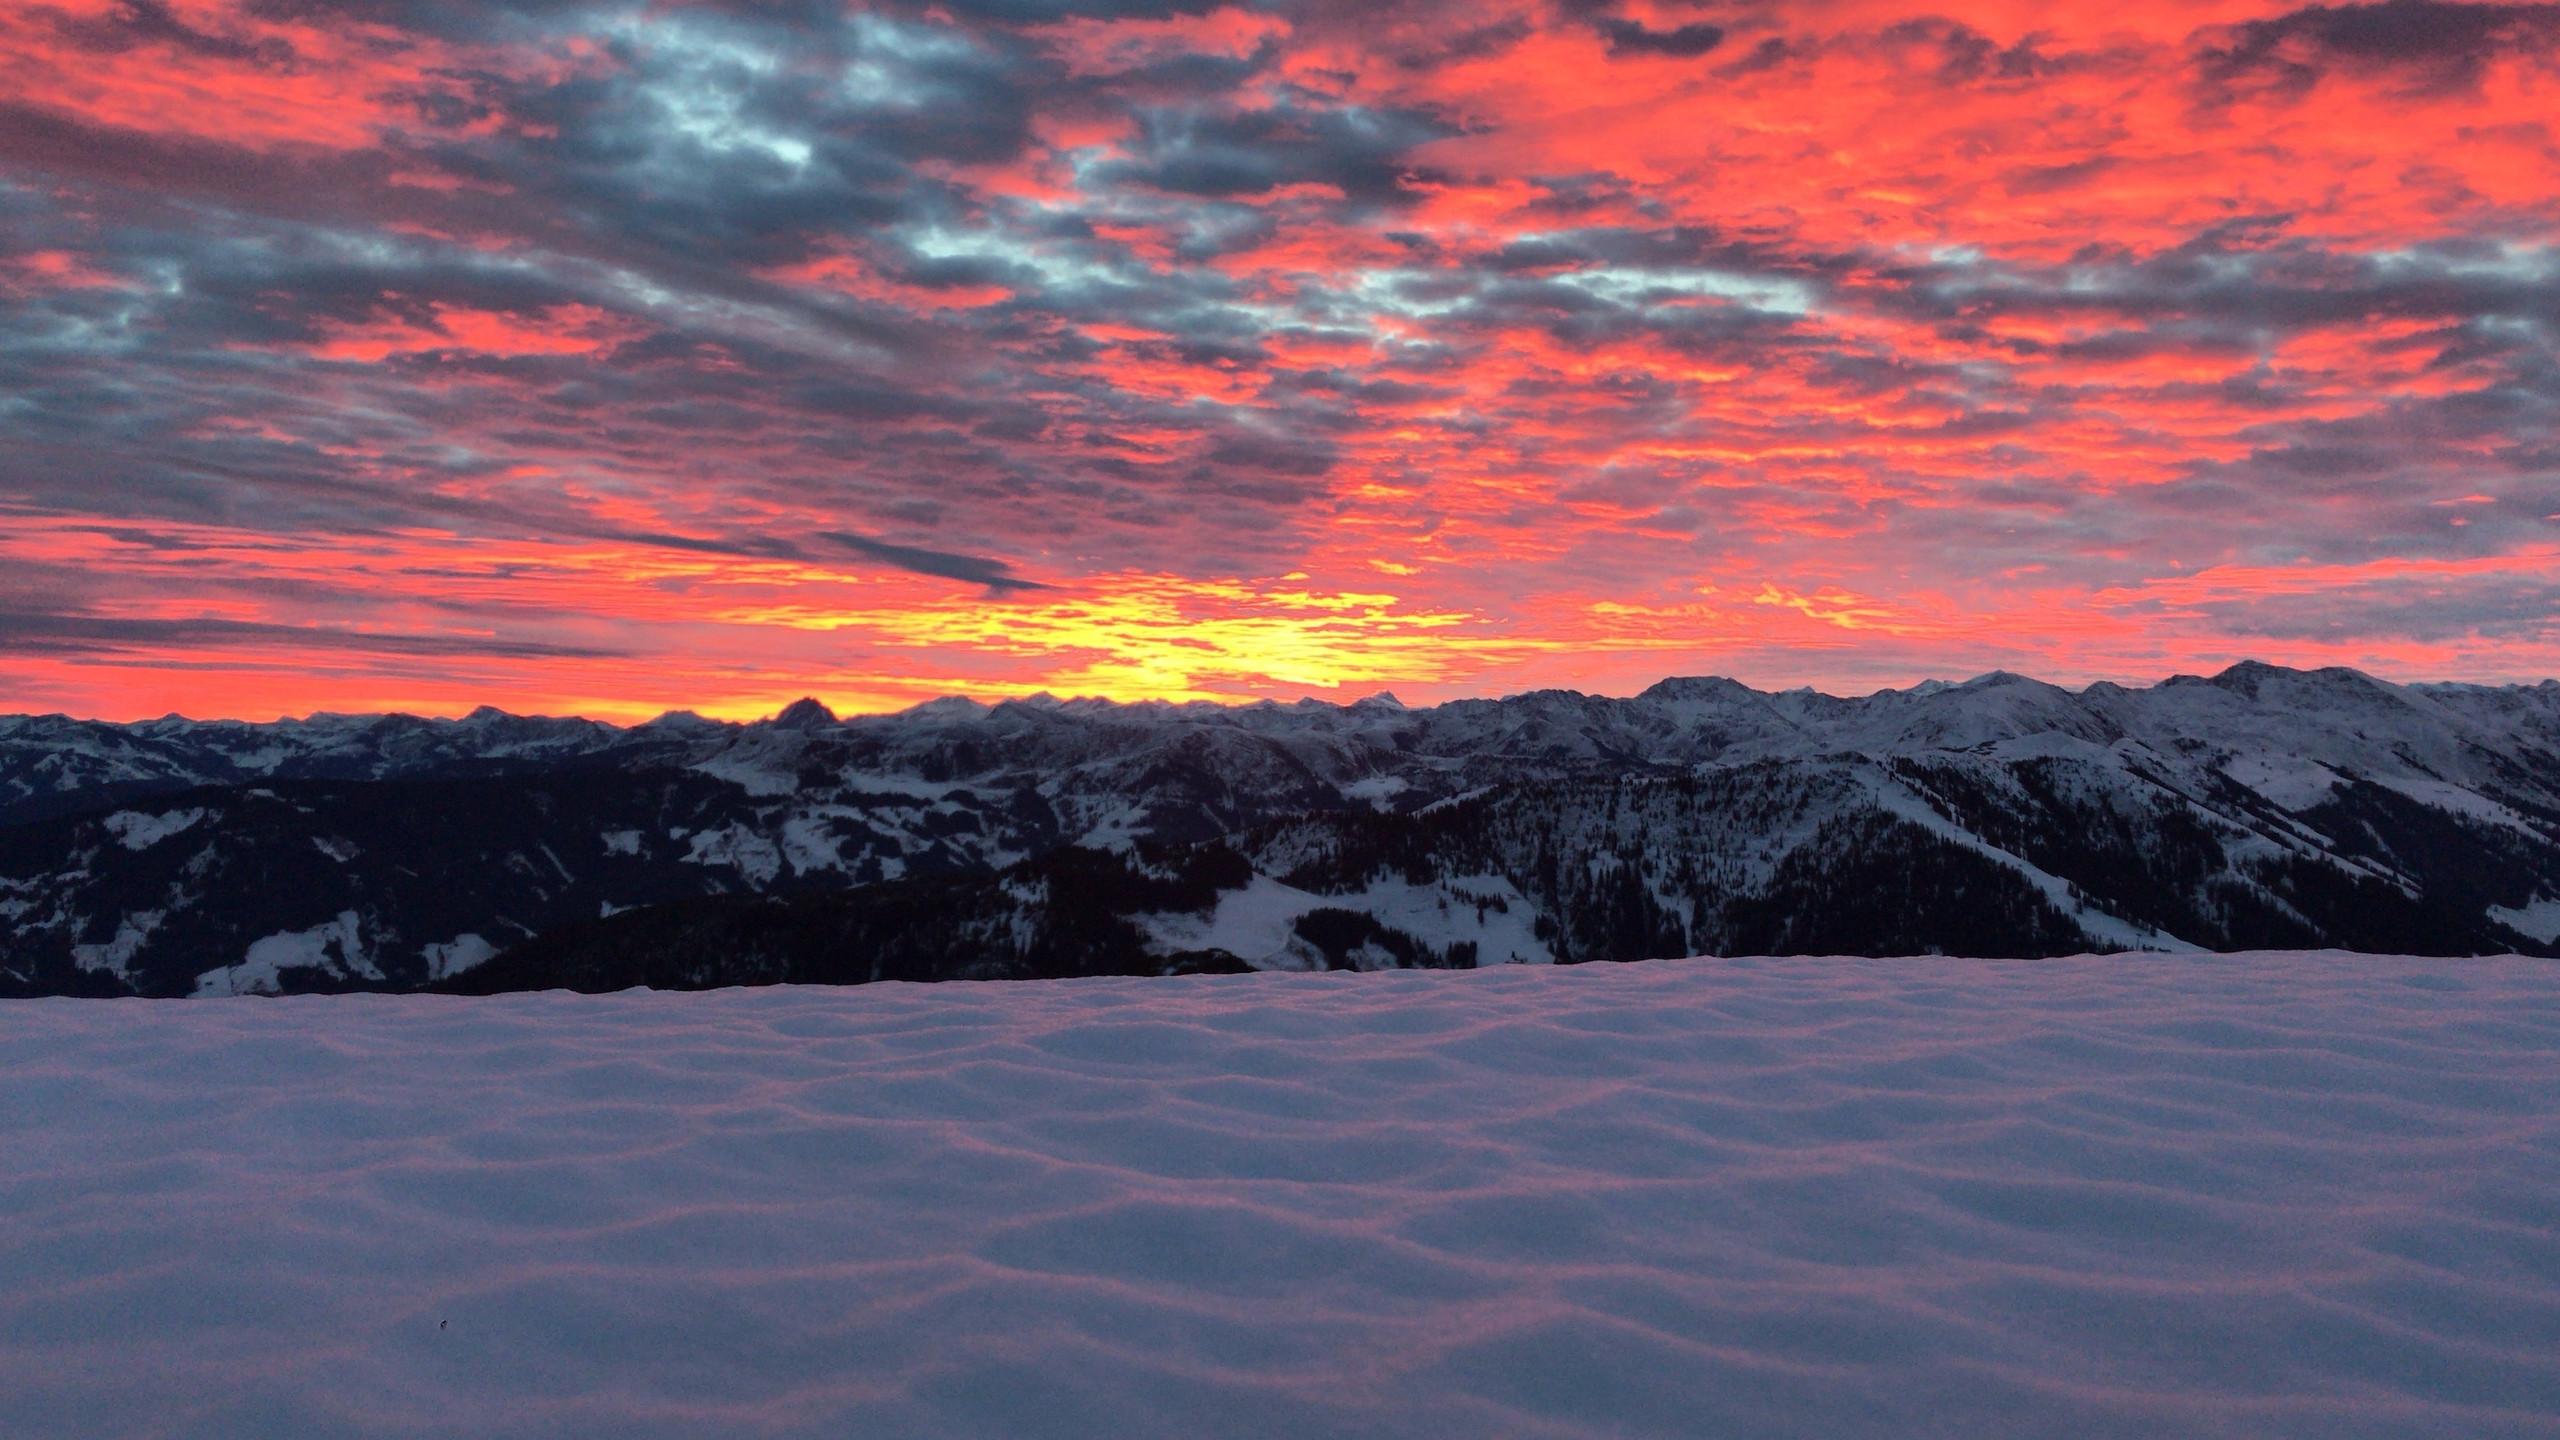 Sonnenaufgang am schneebedeckten Gipfel, Sonnenaufgangstour Alpbachtal